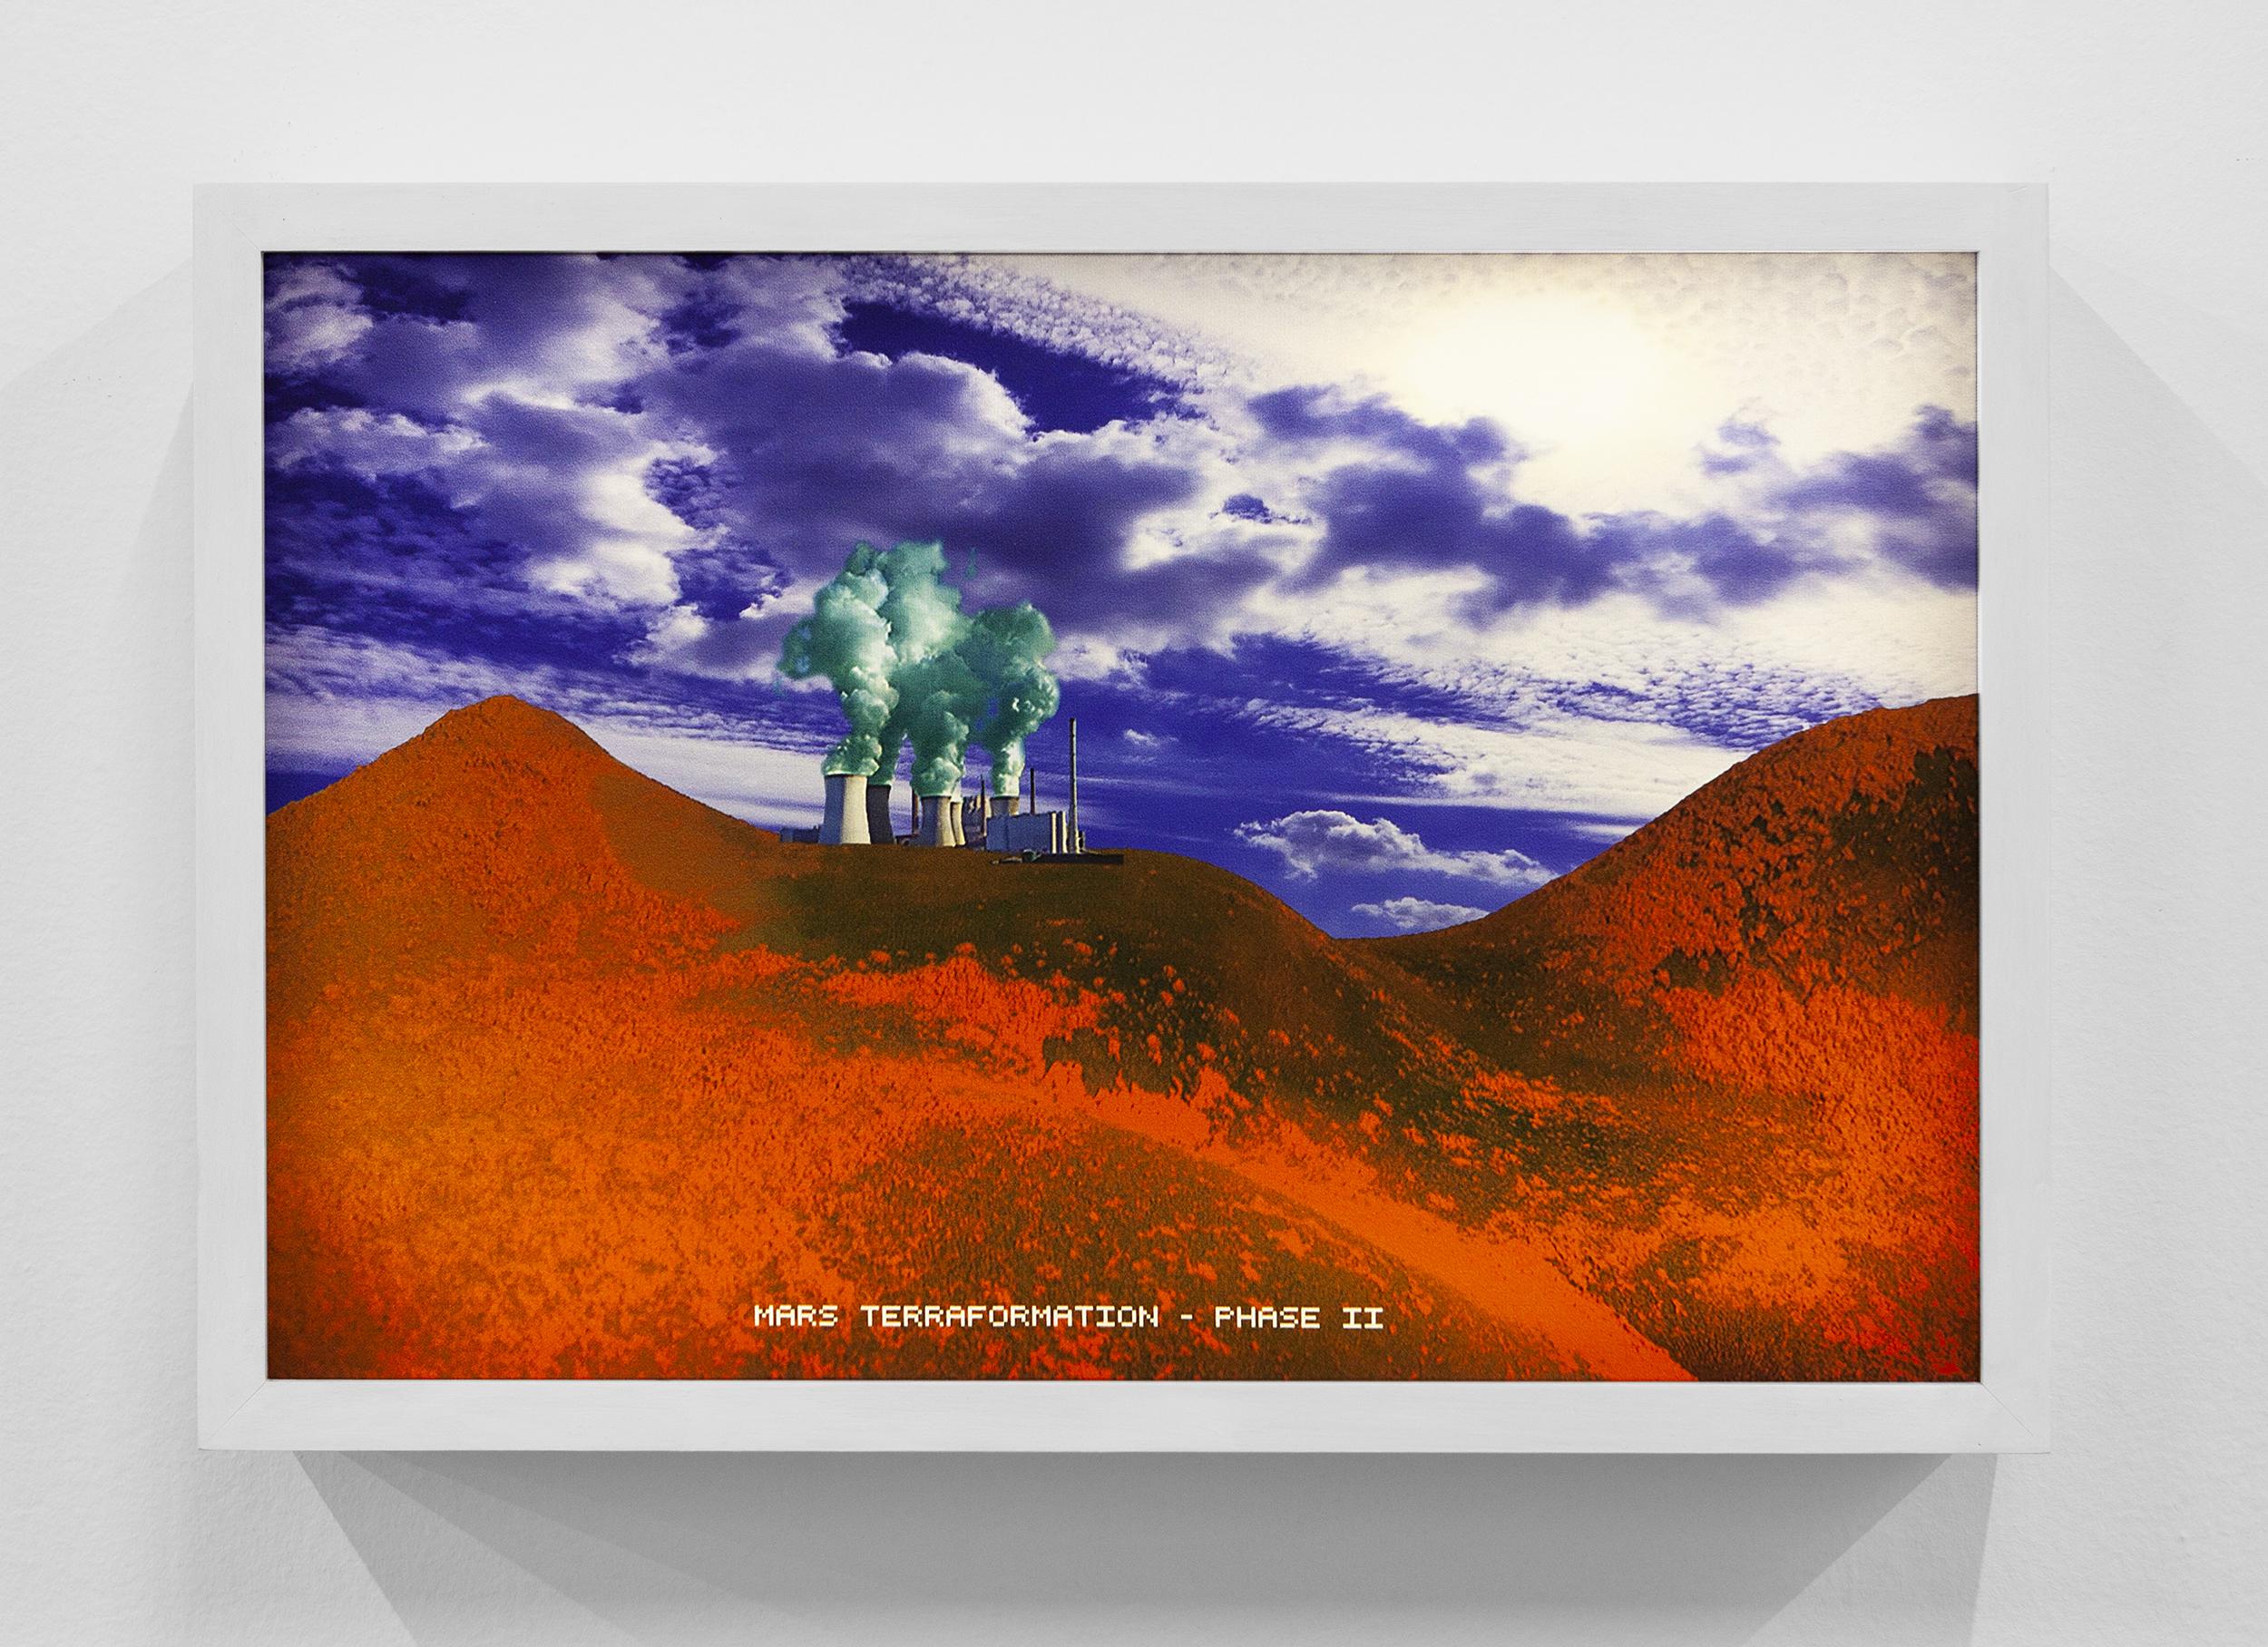 Mars Terraformation - Phase II.jpg